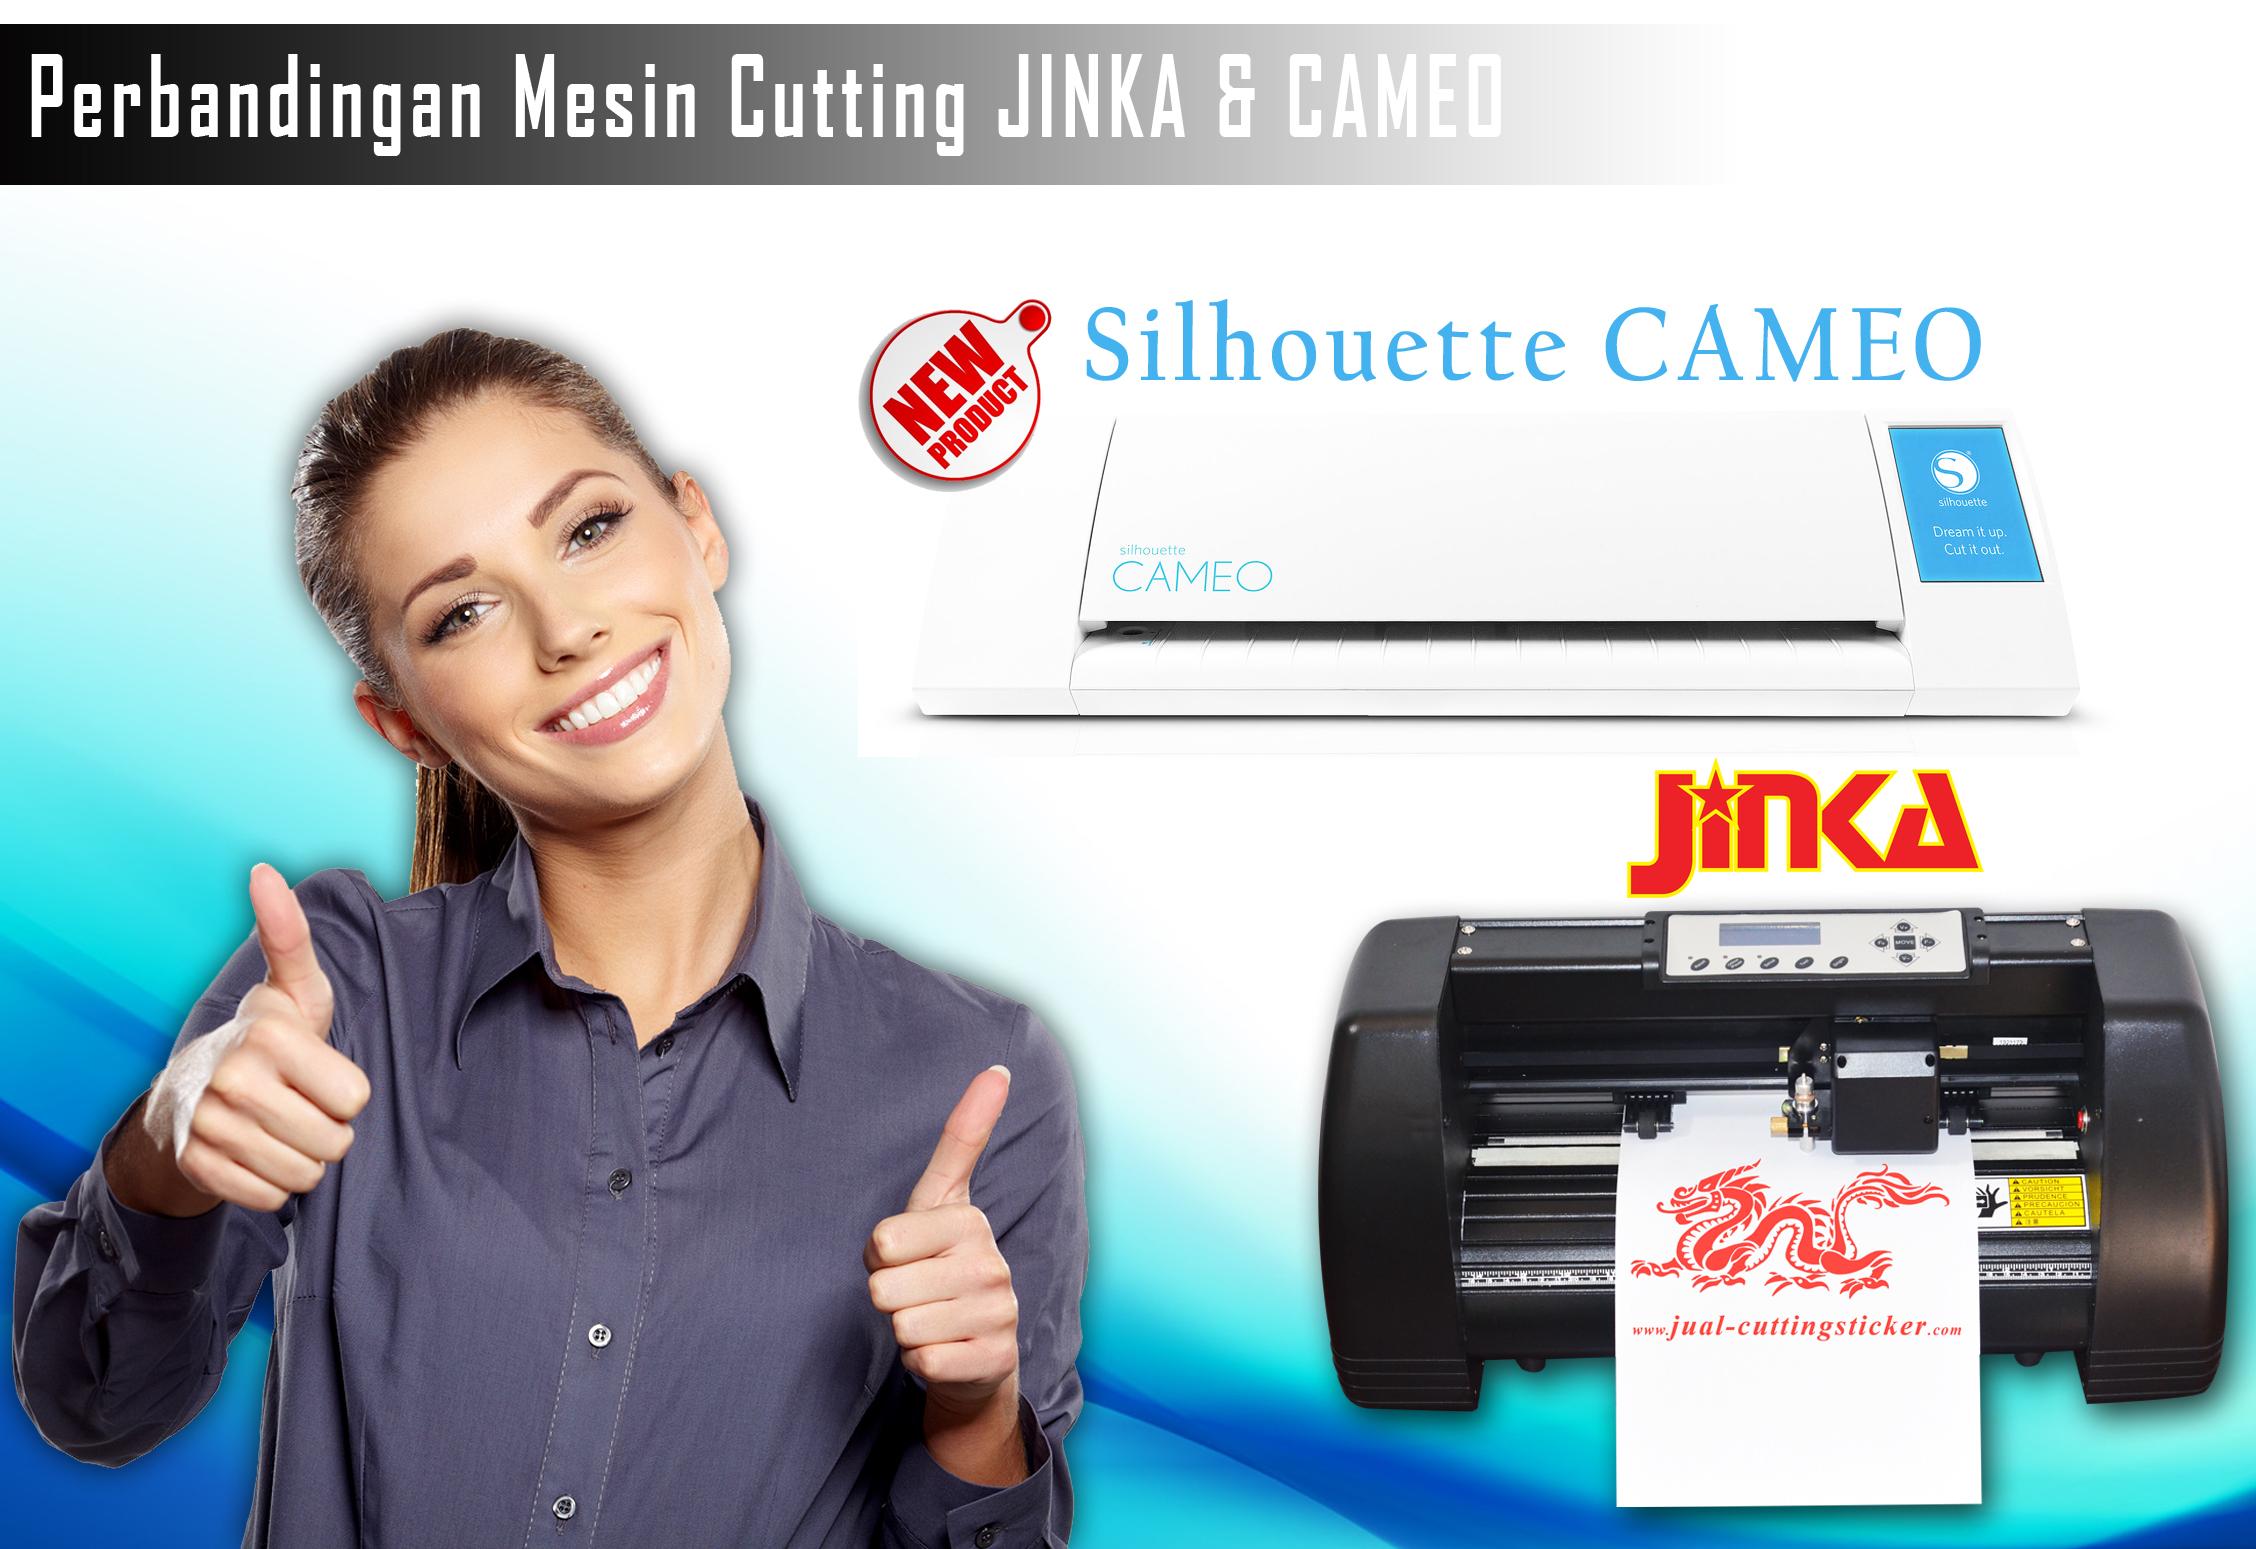 Perbandingan Mesin Cutting JINKA dan Silhouette CAMEO